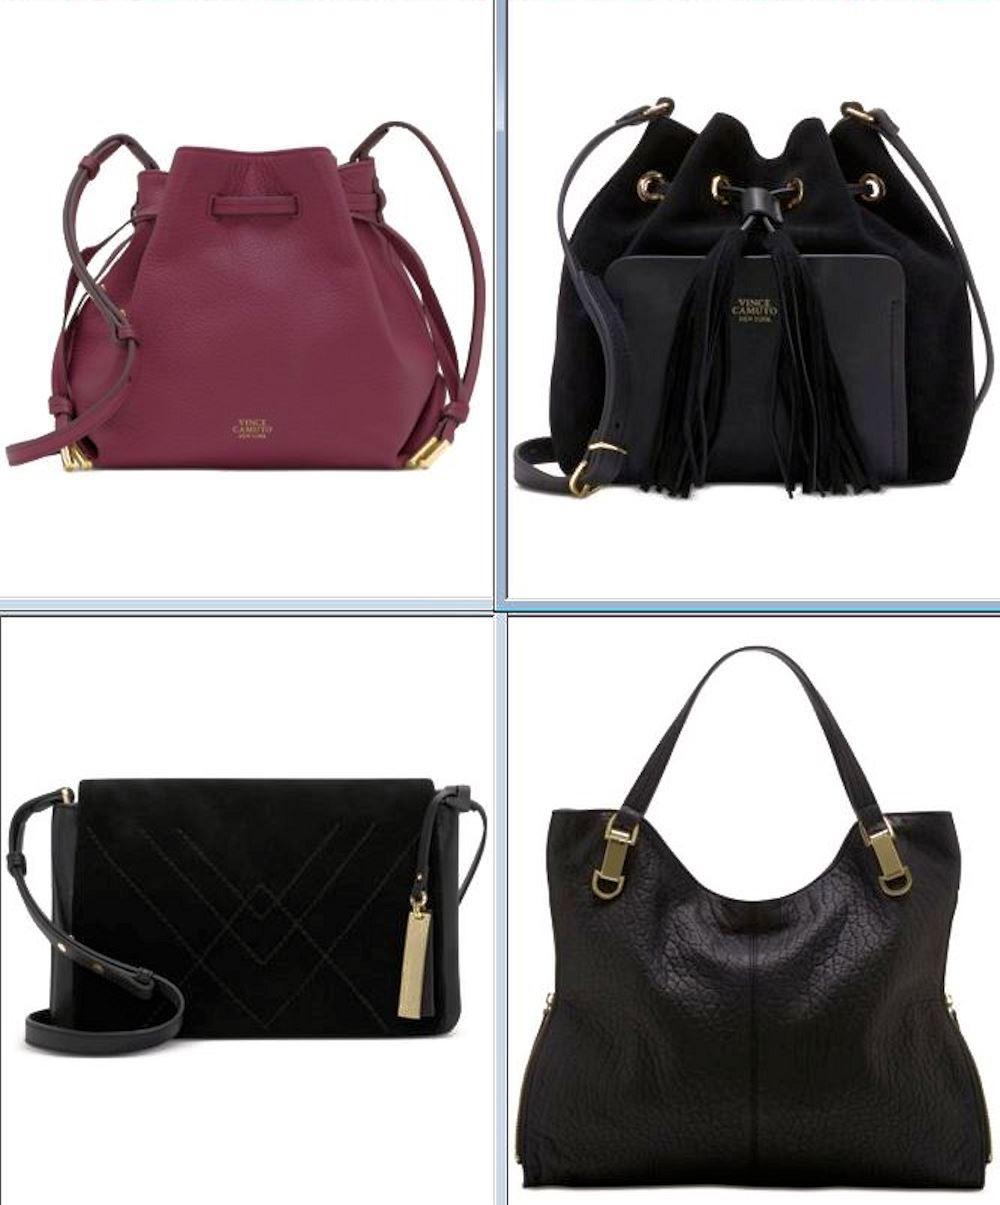 2039fe6be1 Wholesale Pallet of 180 High End Womens Designer Handbags Purses ...